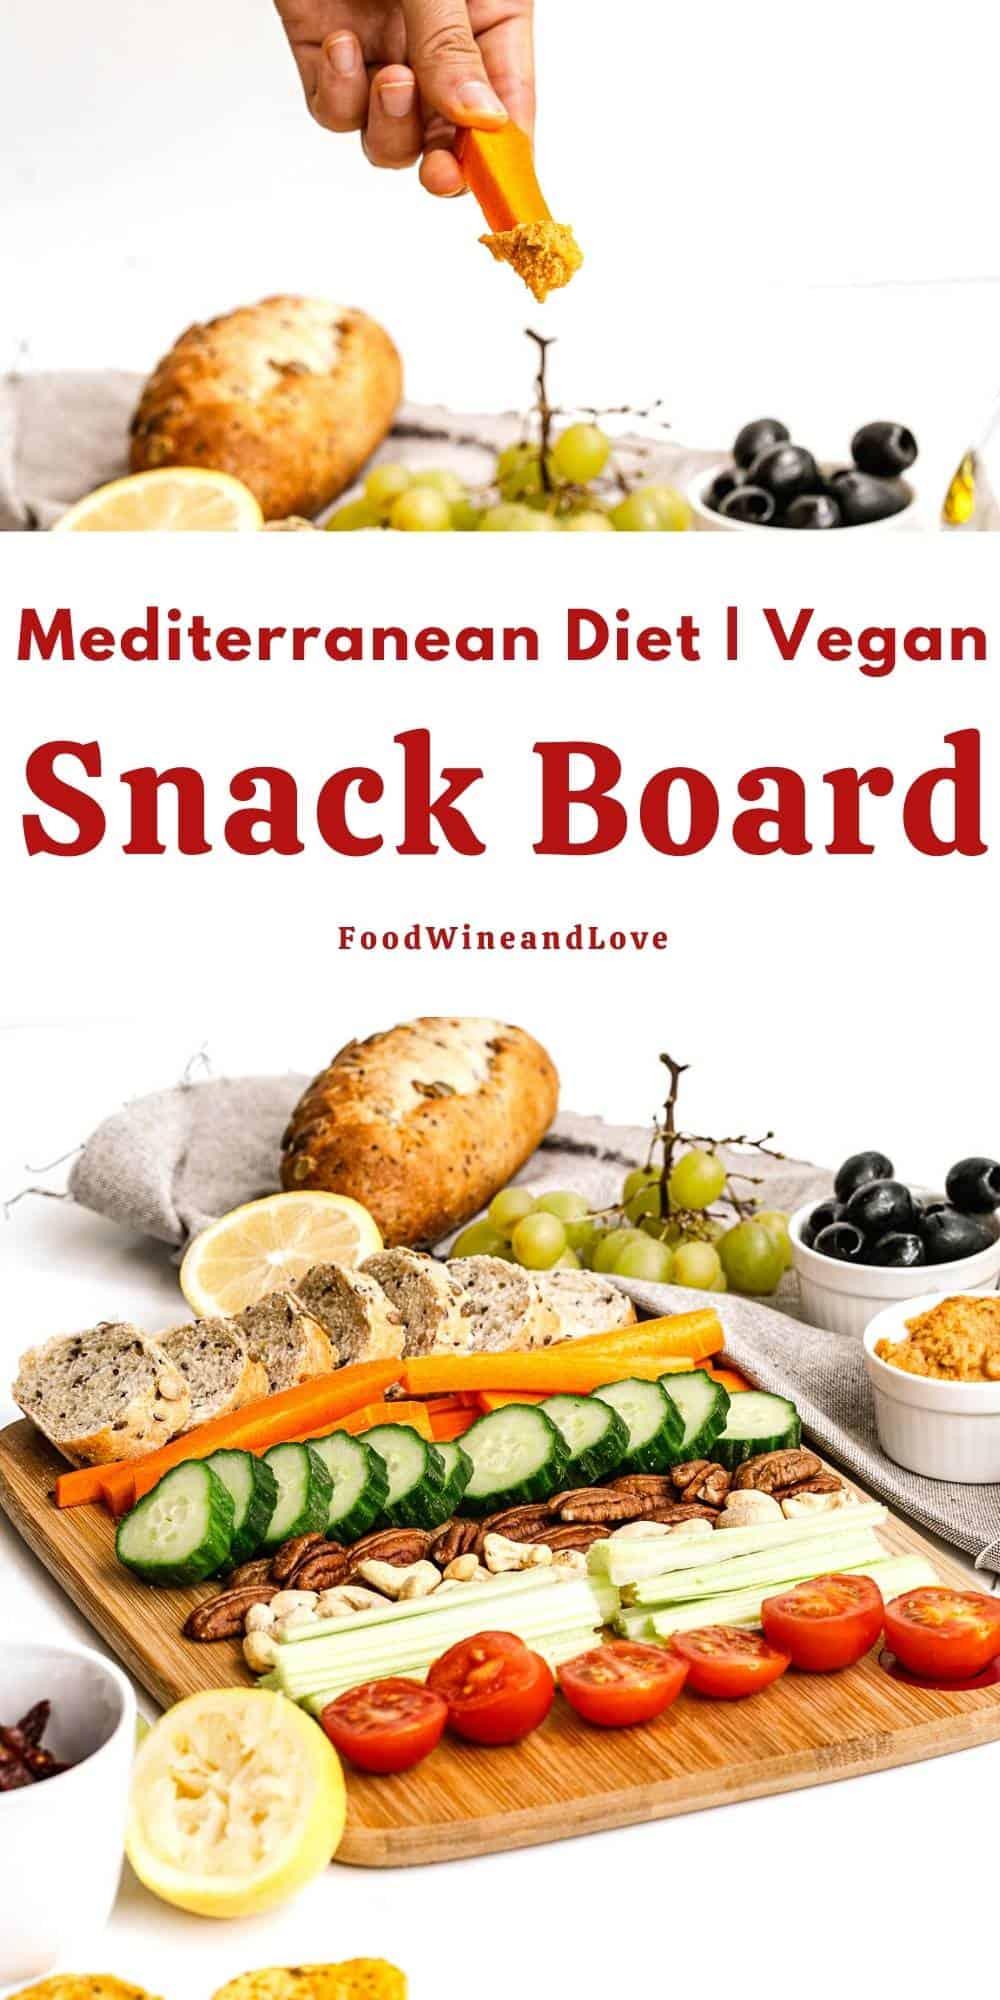 Vegan Mediterranean Diet Snack Board